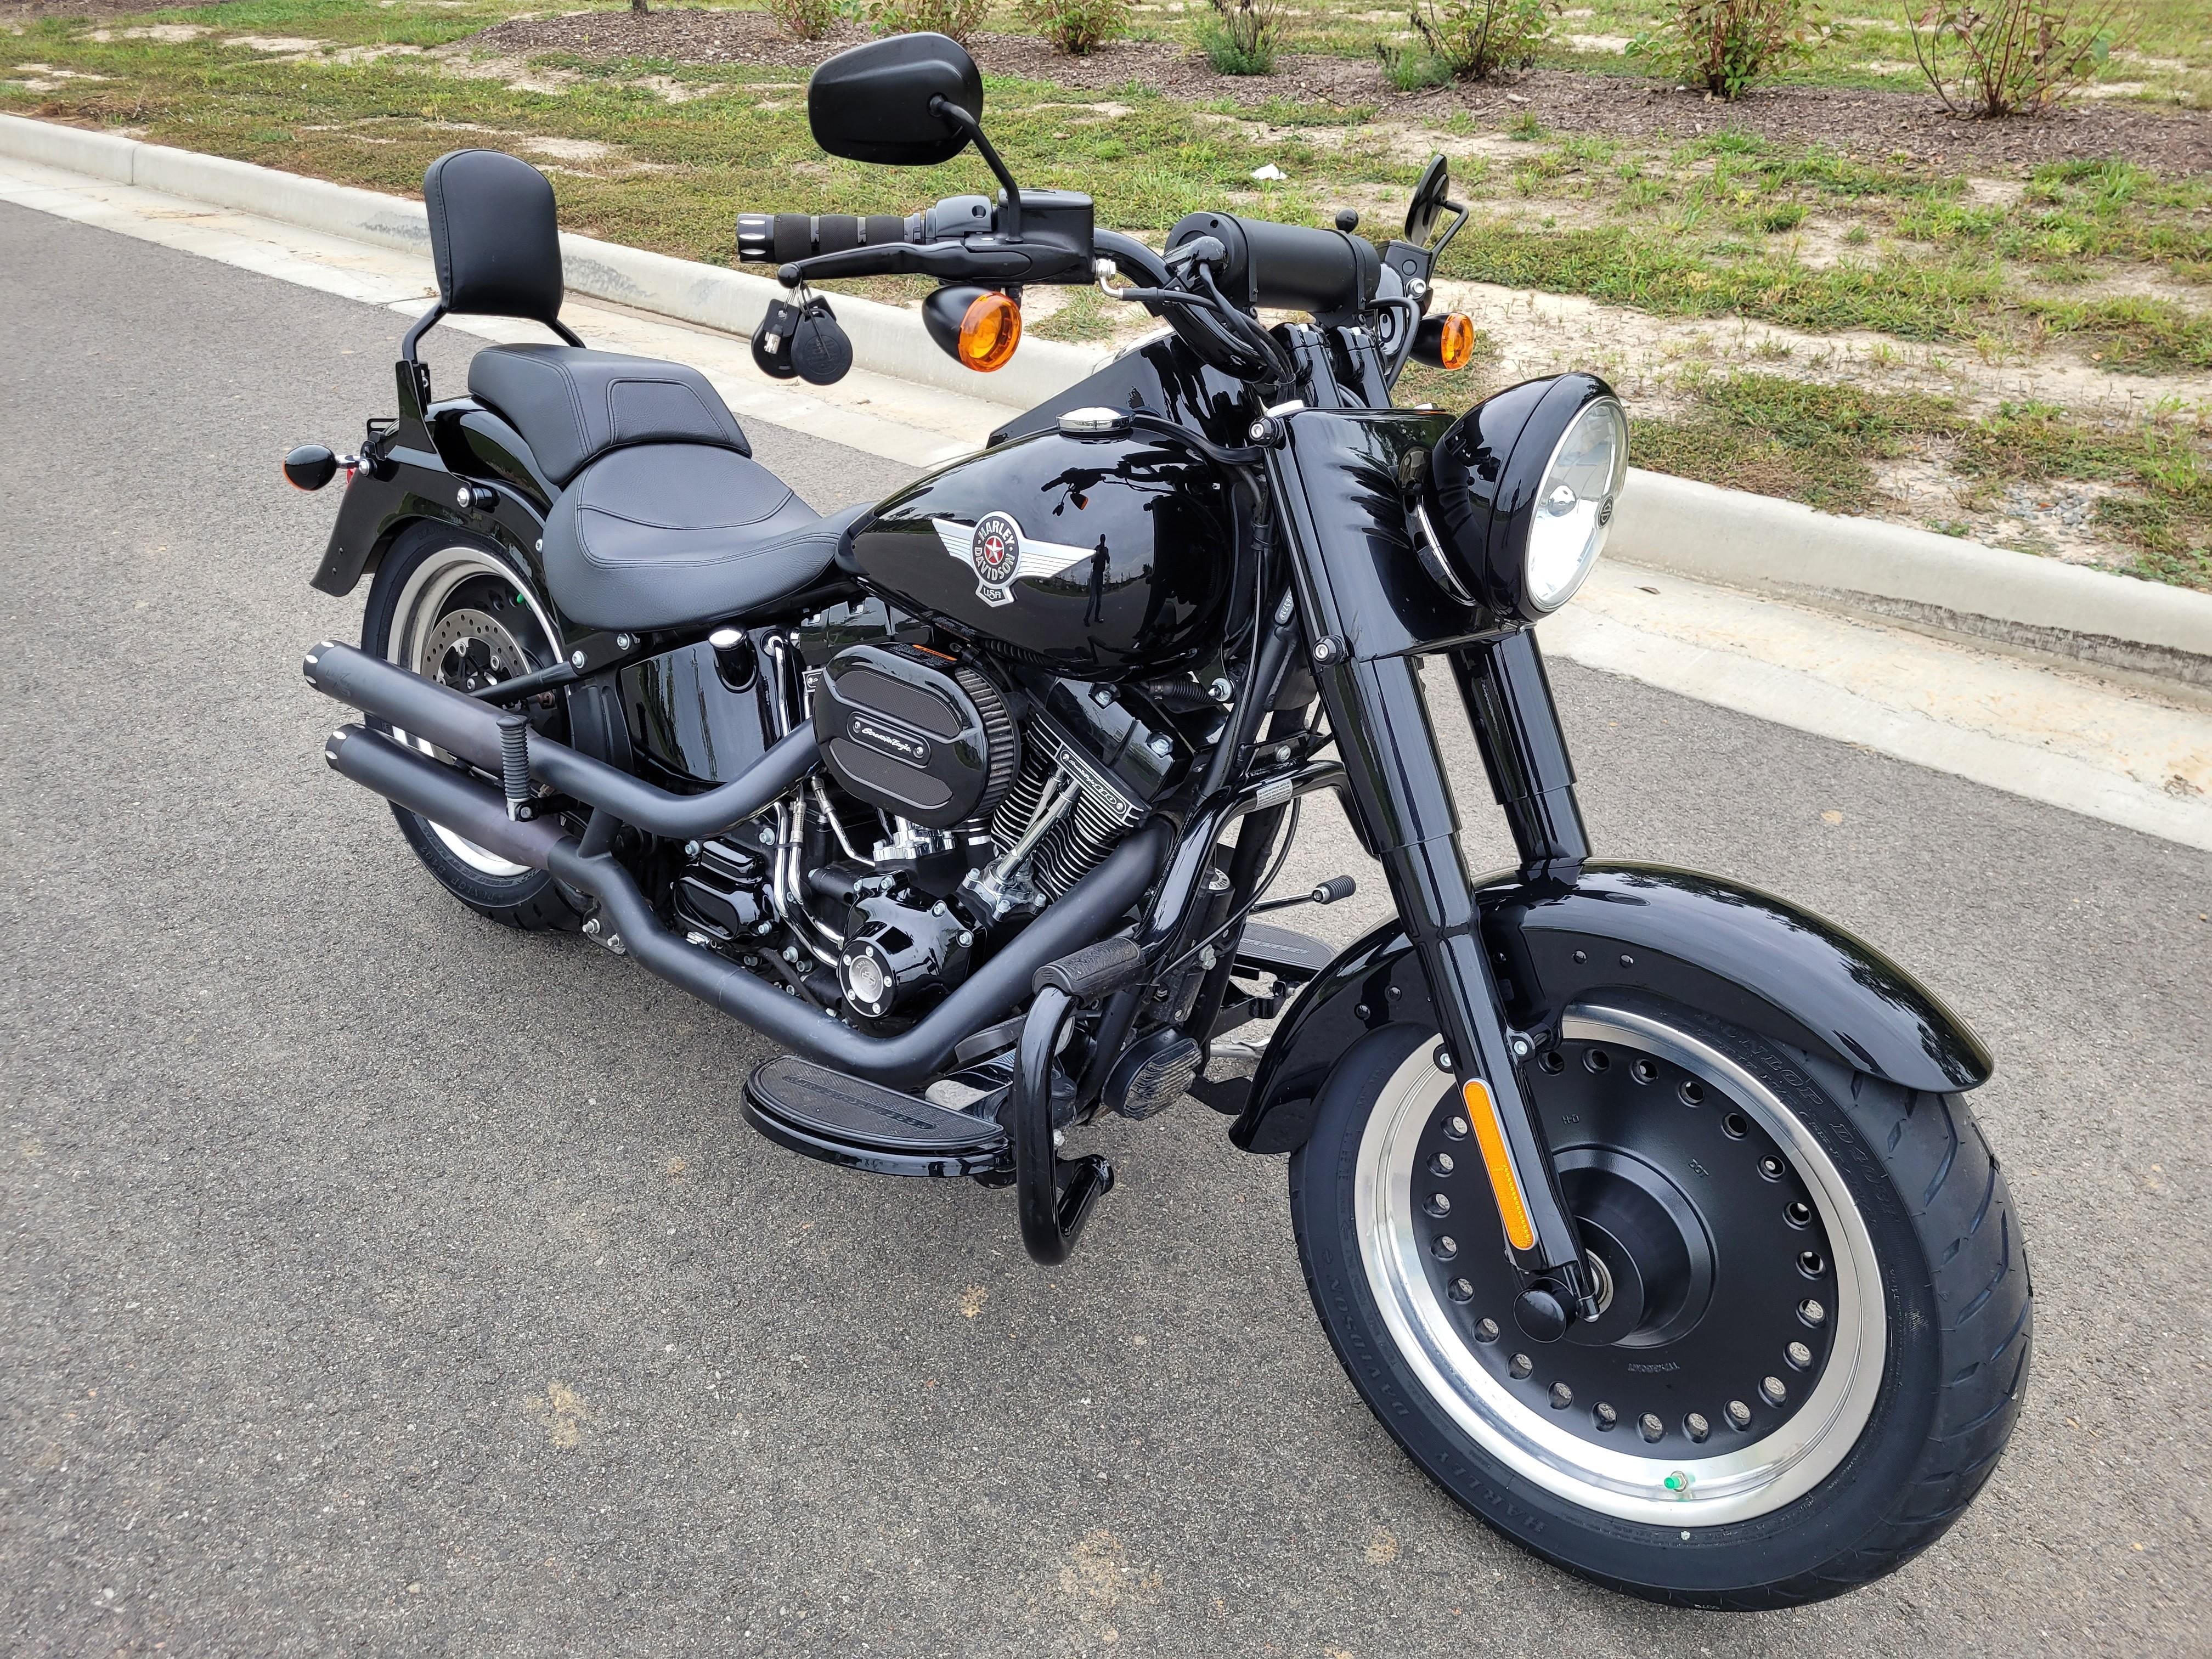 2016 Harley-Davidson S-Series Fat Boy at Richmond Harley-Davidson